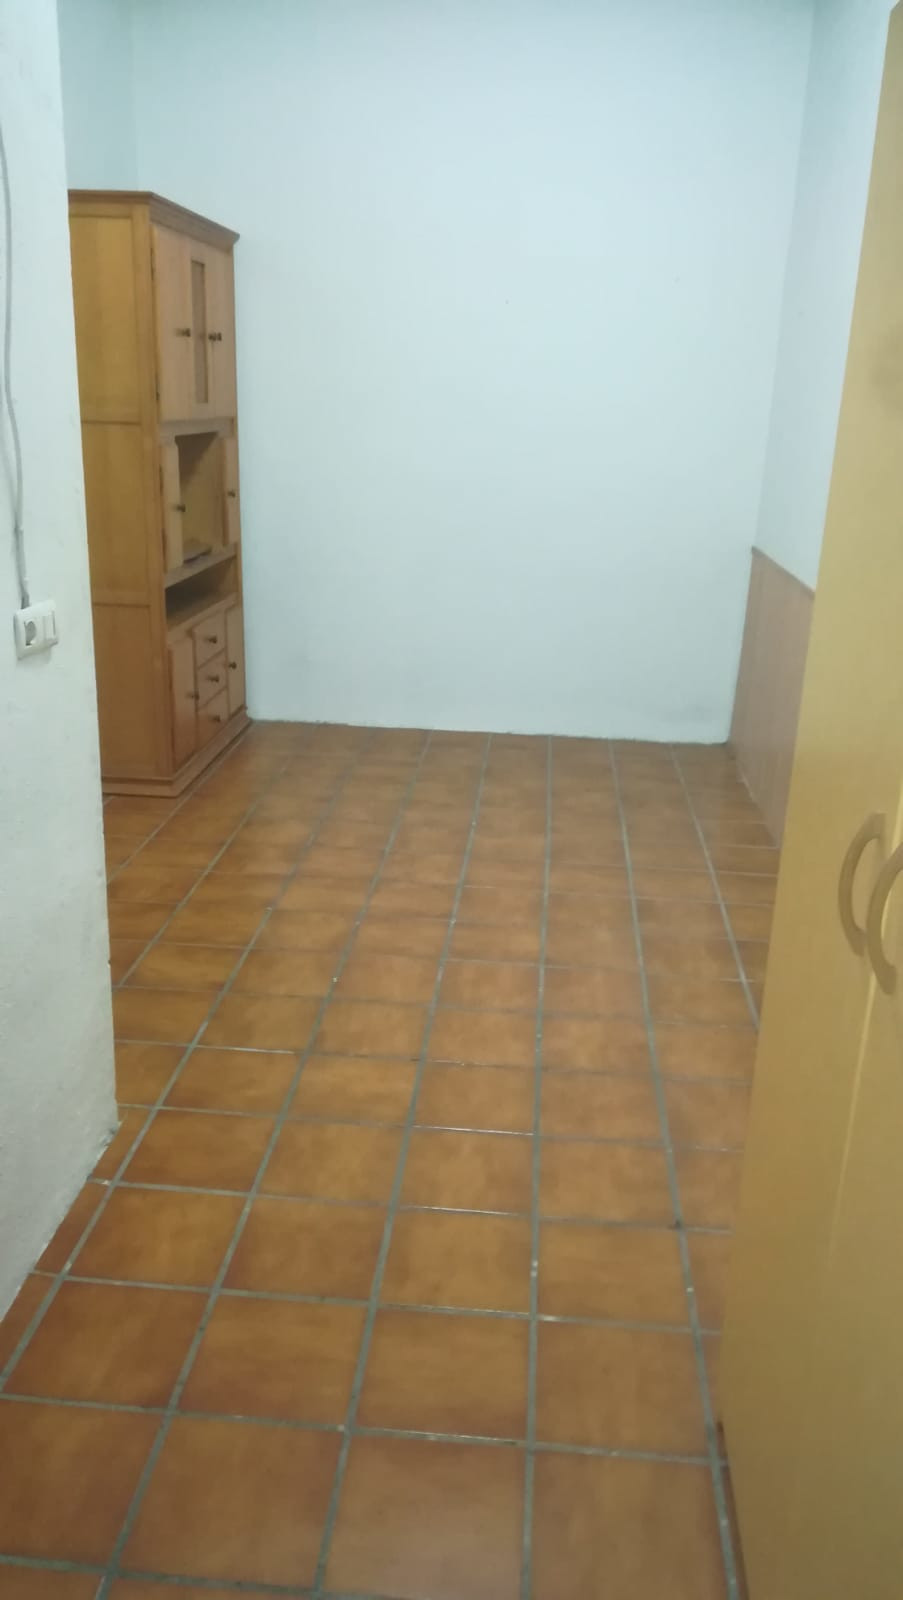 R3606779: House - Townhouse in Churriana